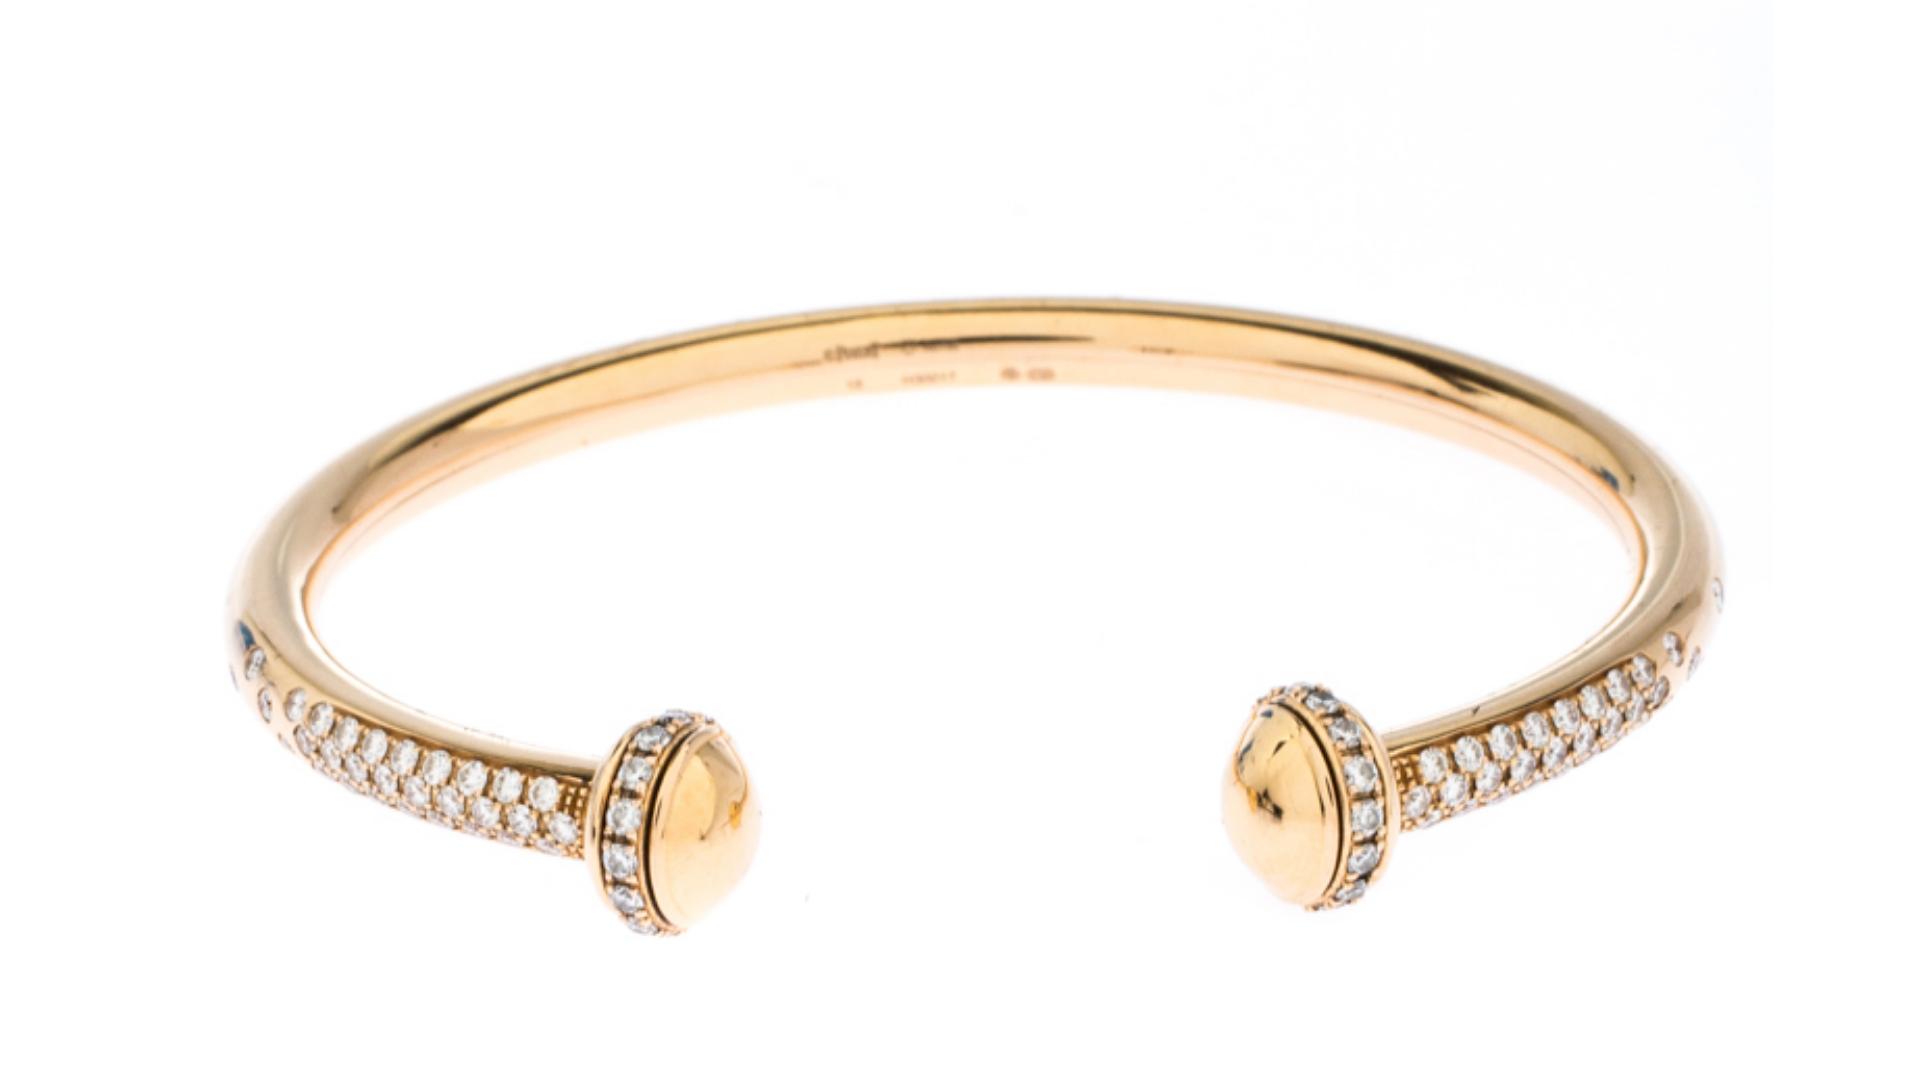 Piaget Diamond Bangle By The Luxury Closet